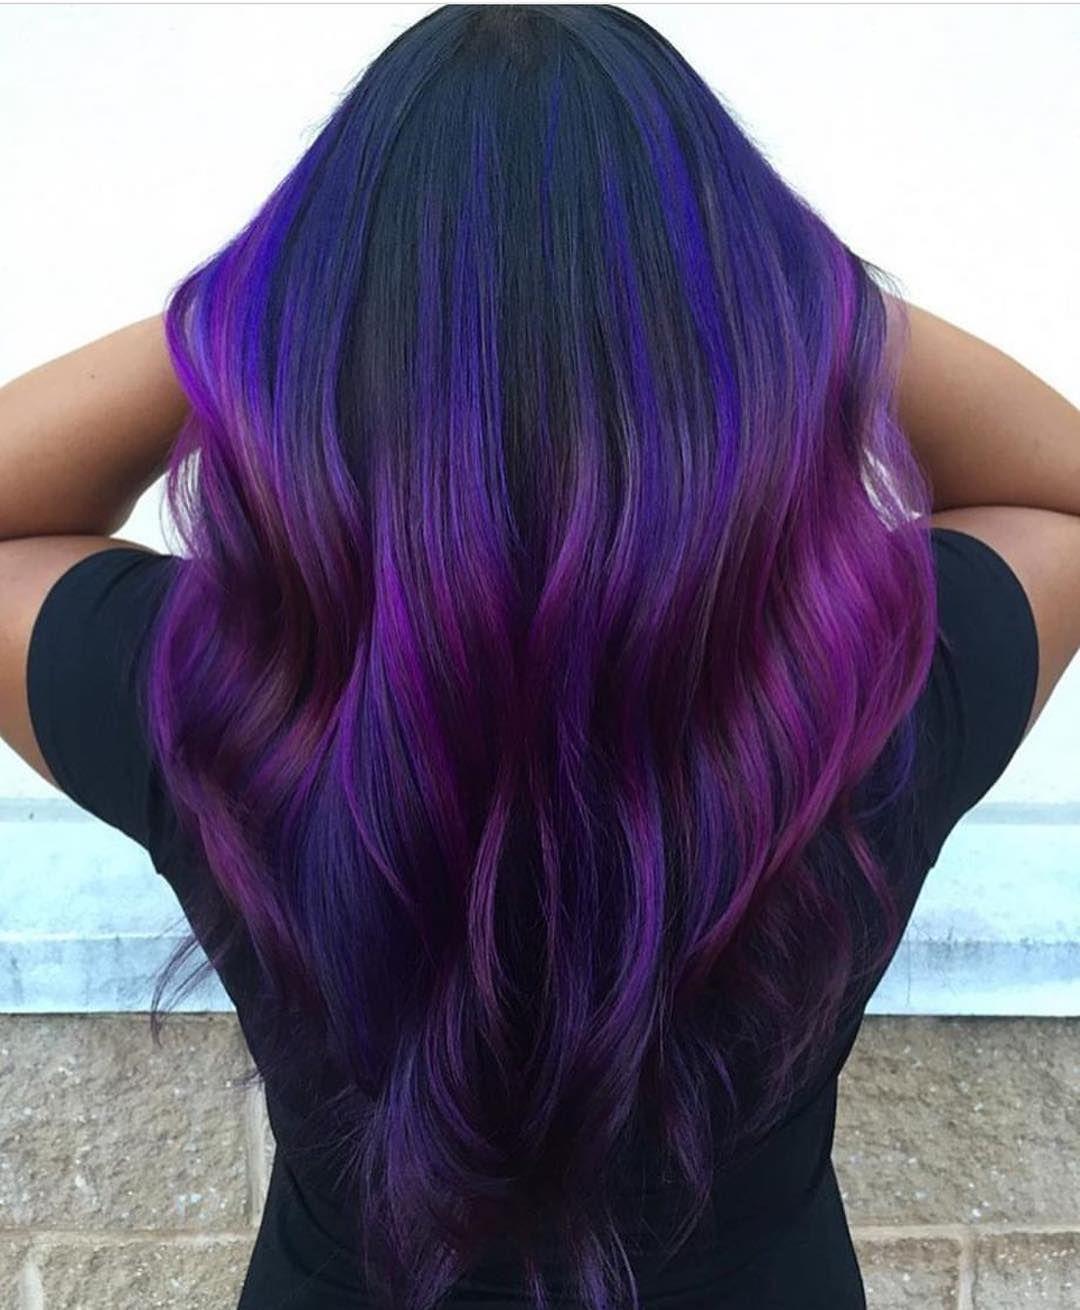 stylish dark purple hair color